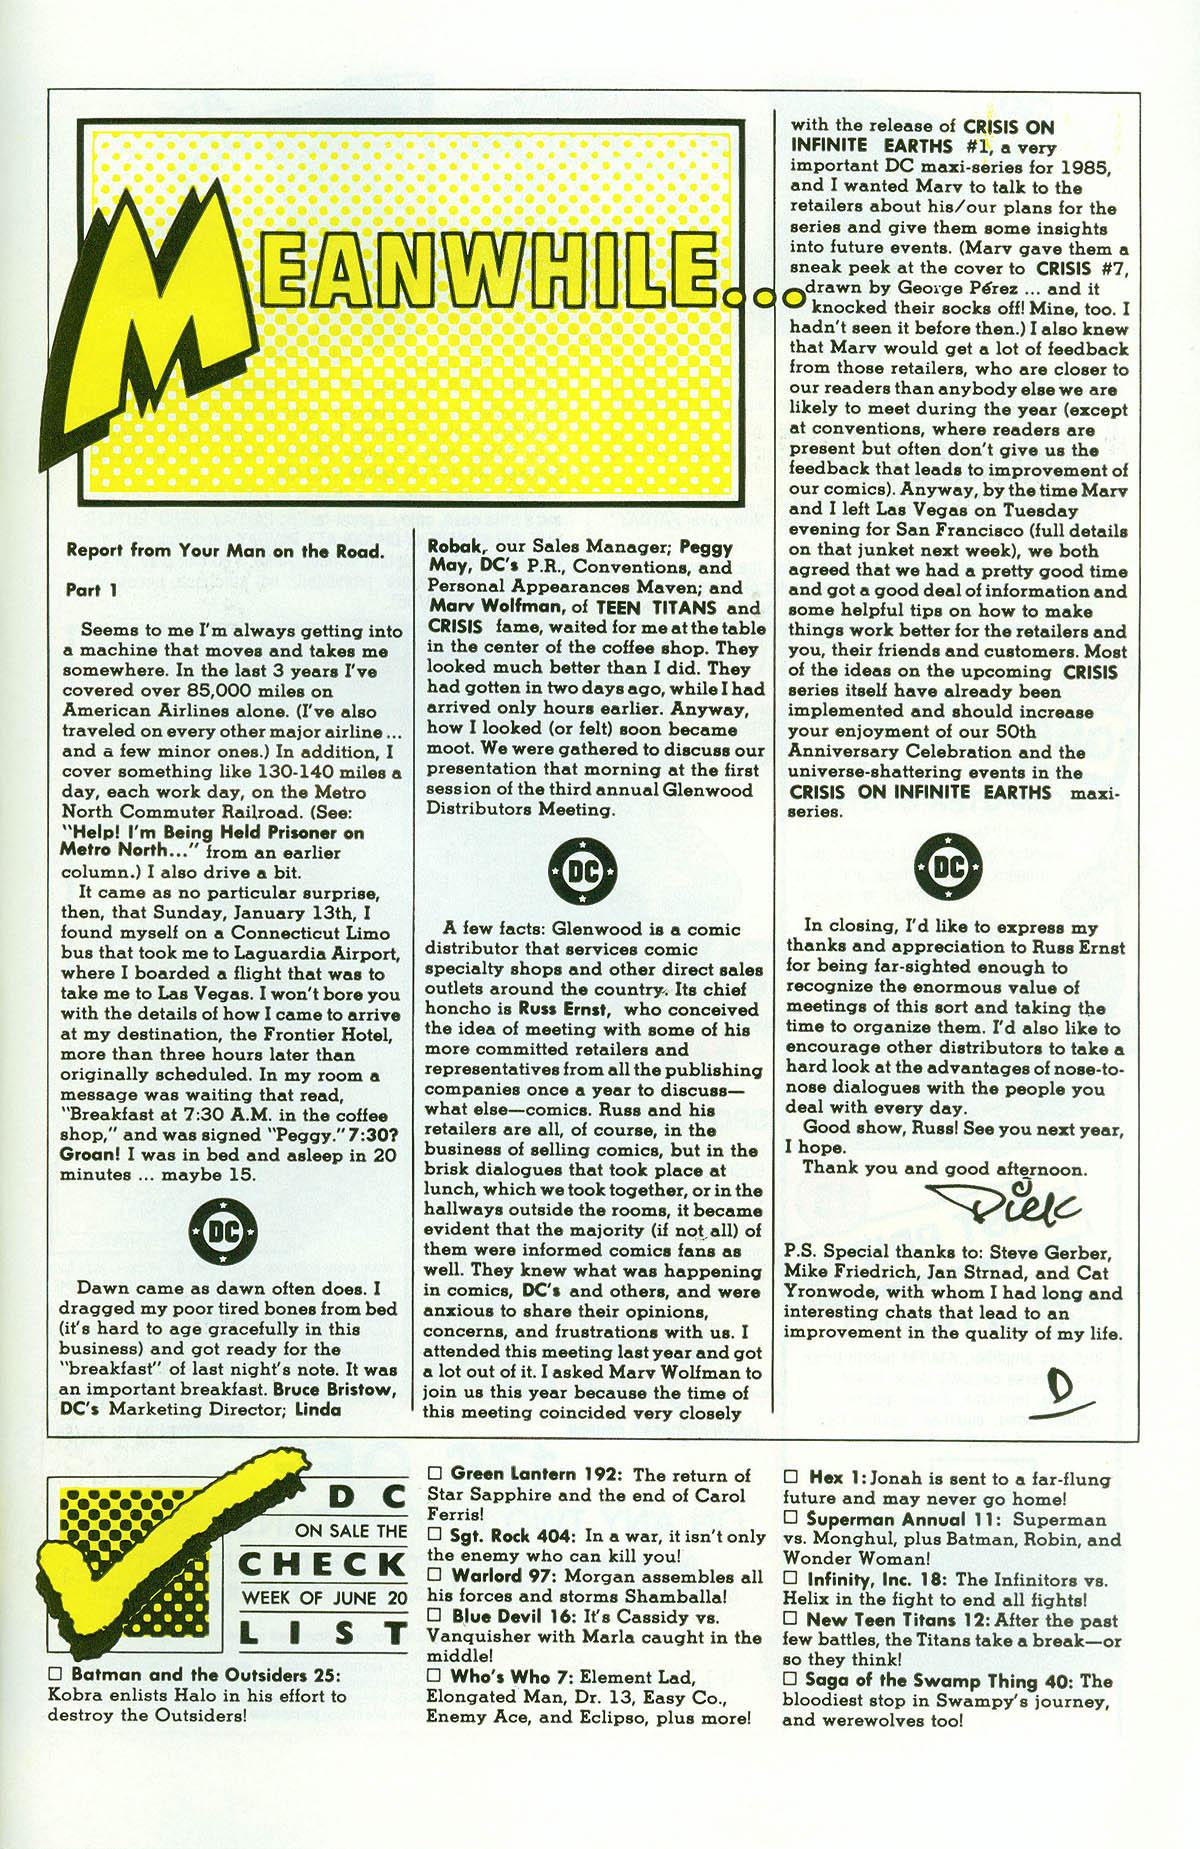 Read online Sgt. Rock comic -  Issue #404 - 35